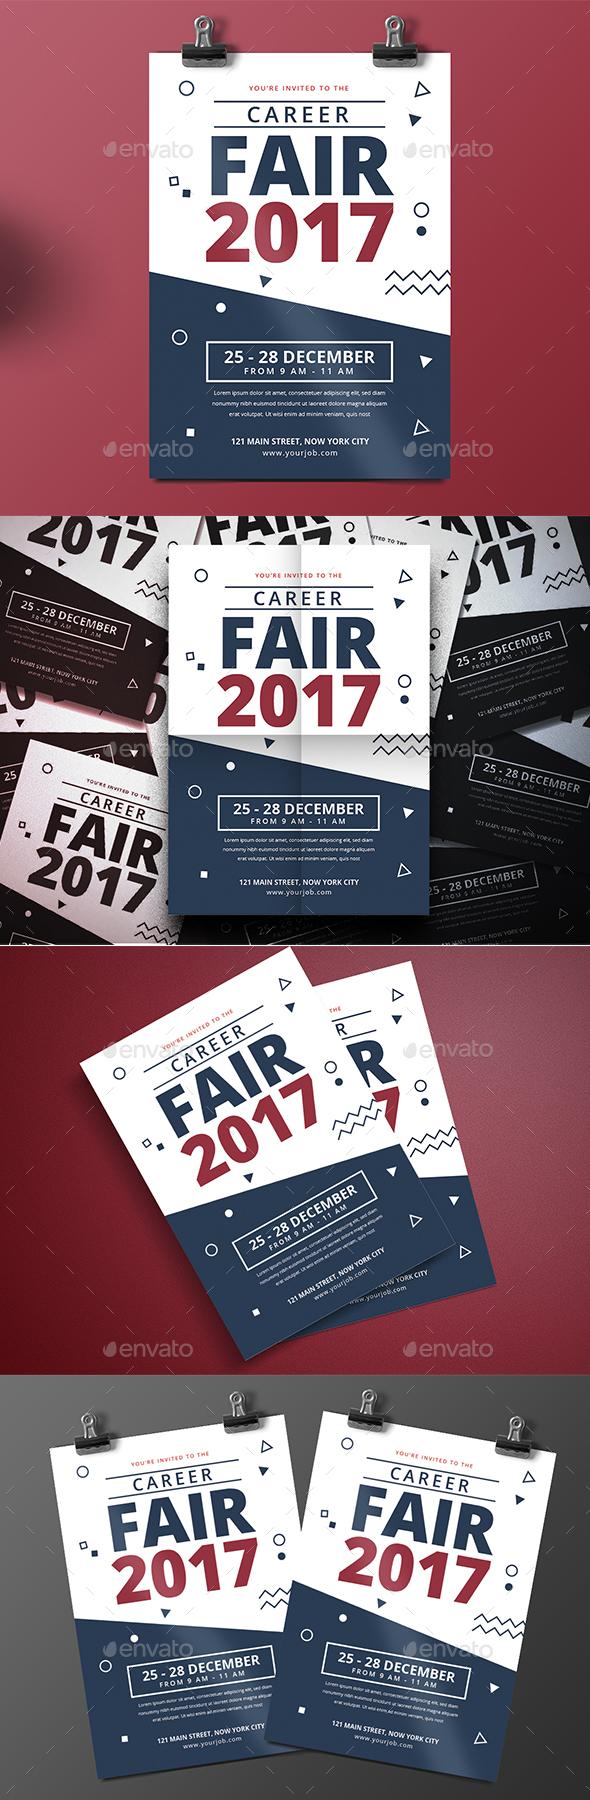 Career Fair Flyer - Corporate Business Cards